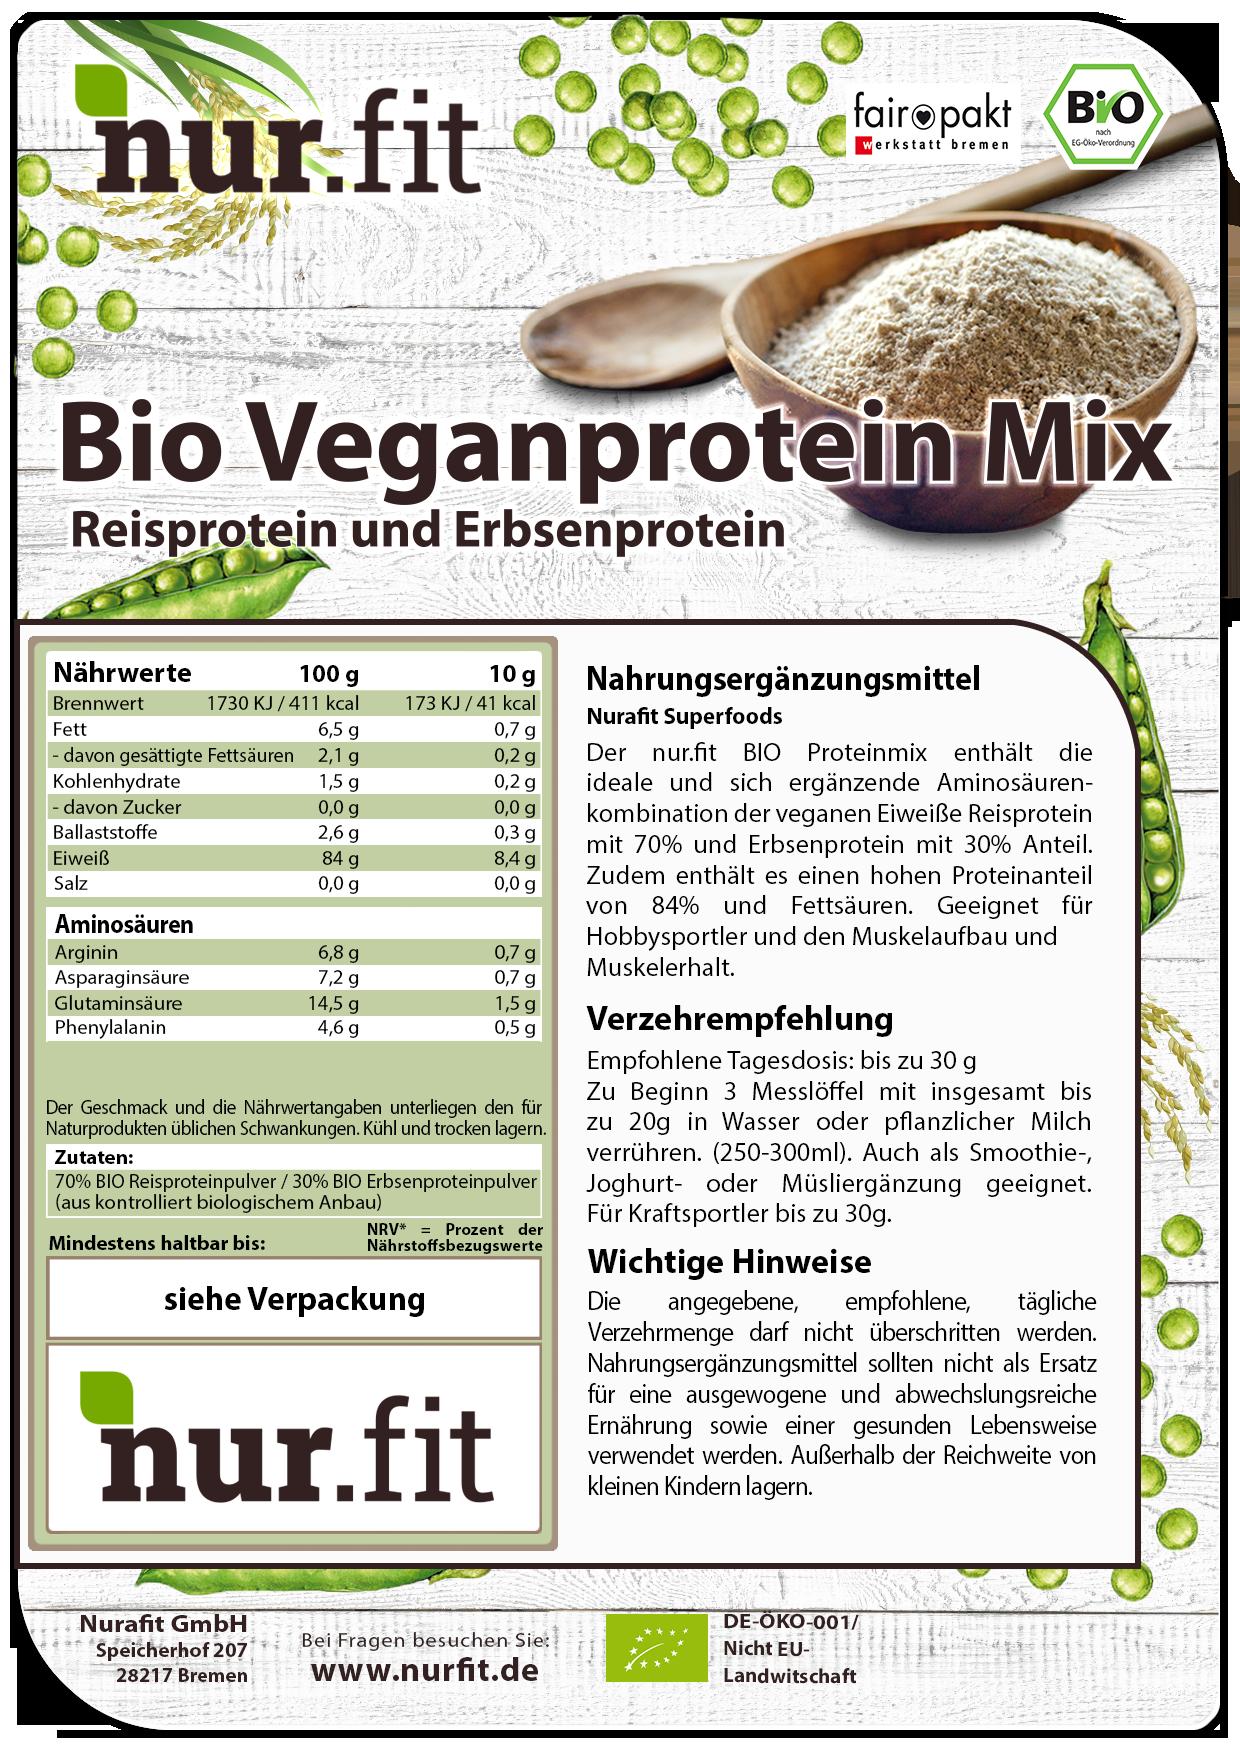 Organic Vegan Protein Mix